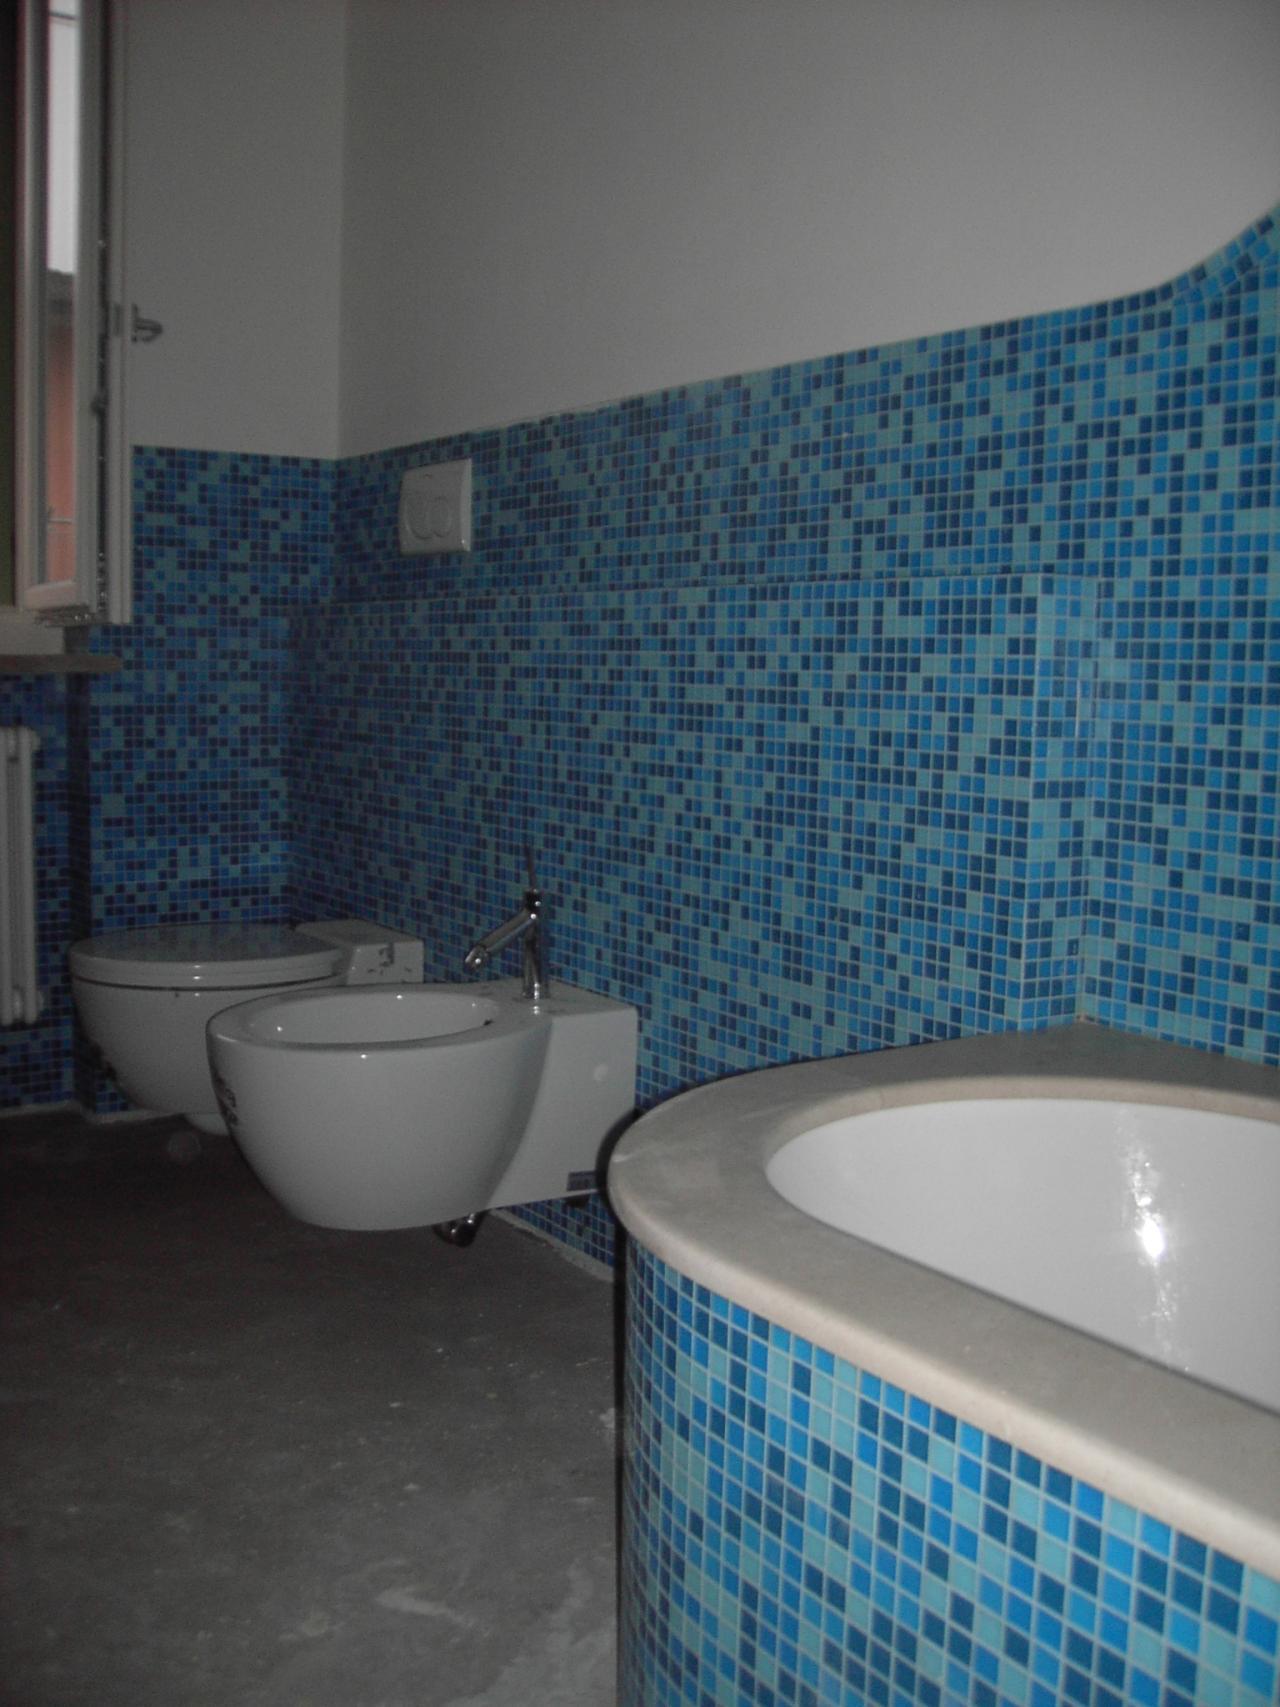 Mosaico in bagno fabulous mosaico in bagno with mosaico - Mosaico in bagno ...